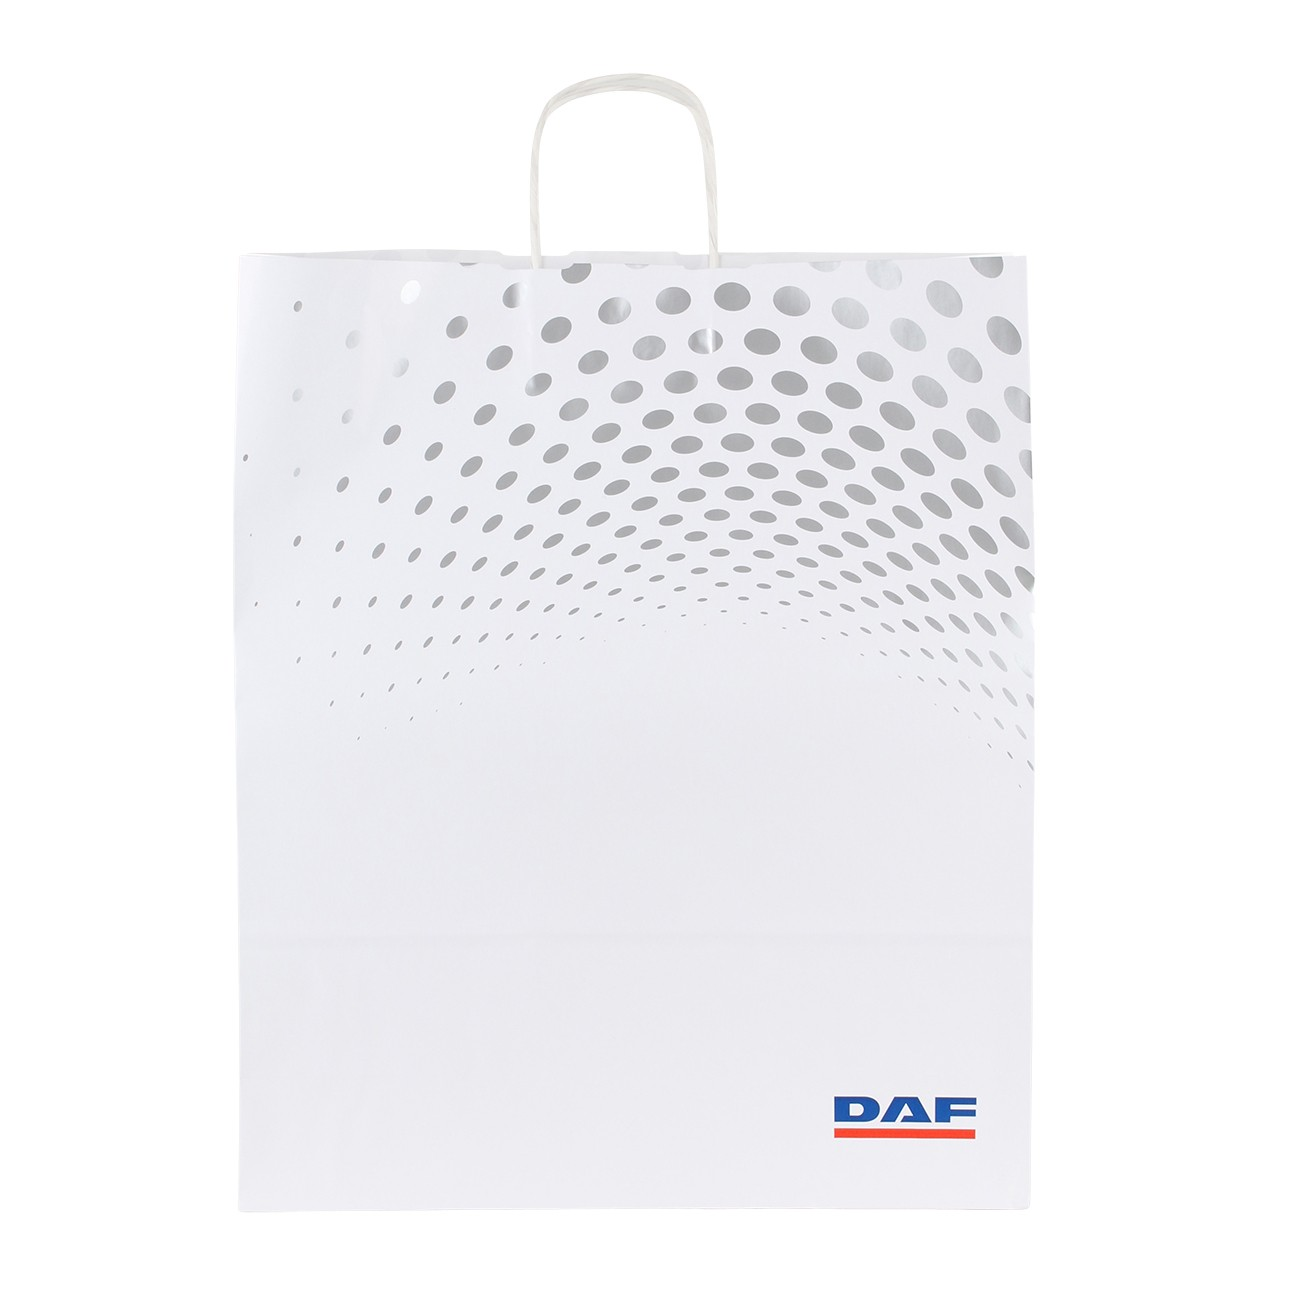 Daf Official – Tas De Webshop Officiële Papieren JTlKc3F1